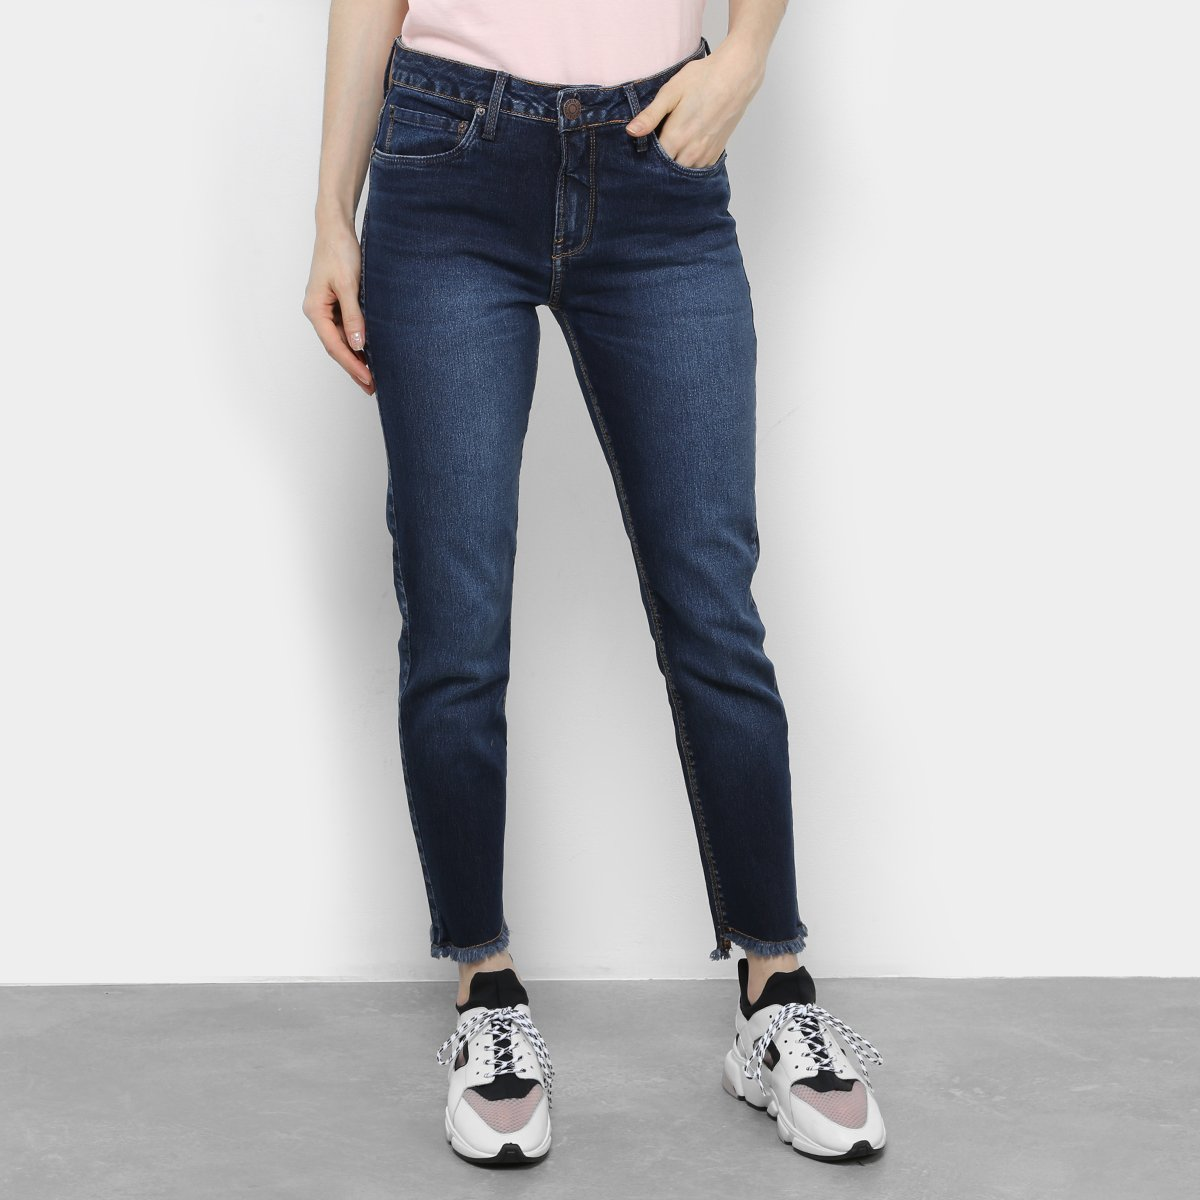 07ea0bebd197b Calça Jeans Slim Calvin Klein Cintura Média Feminina